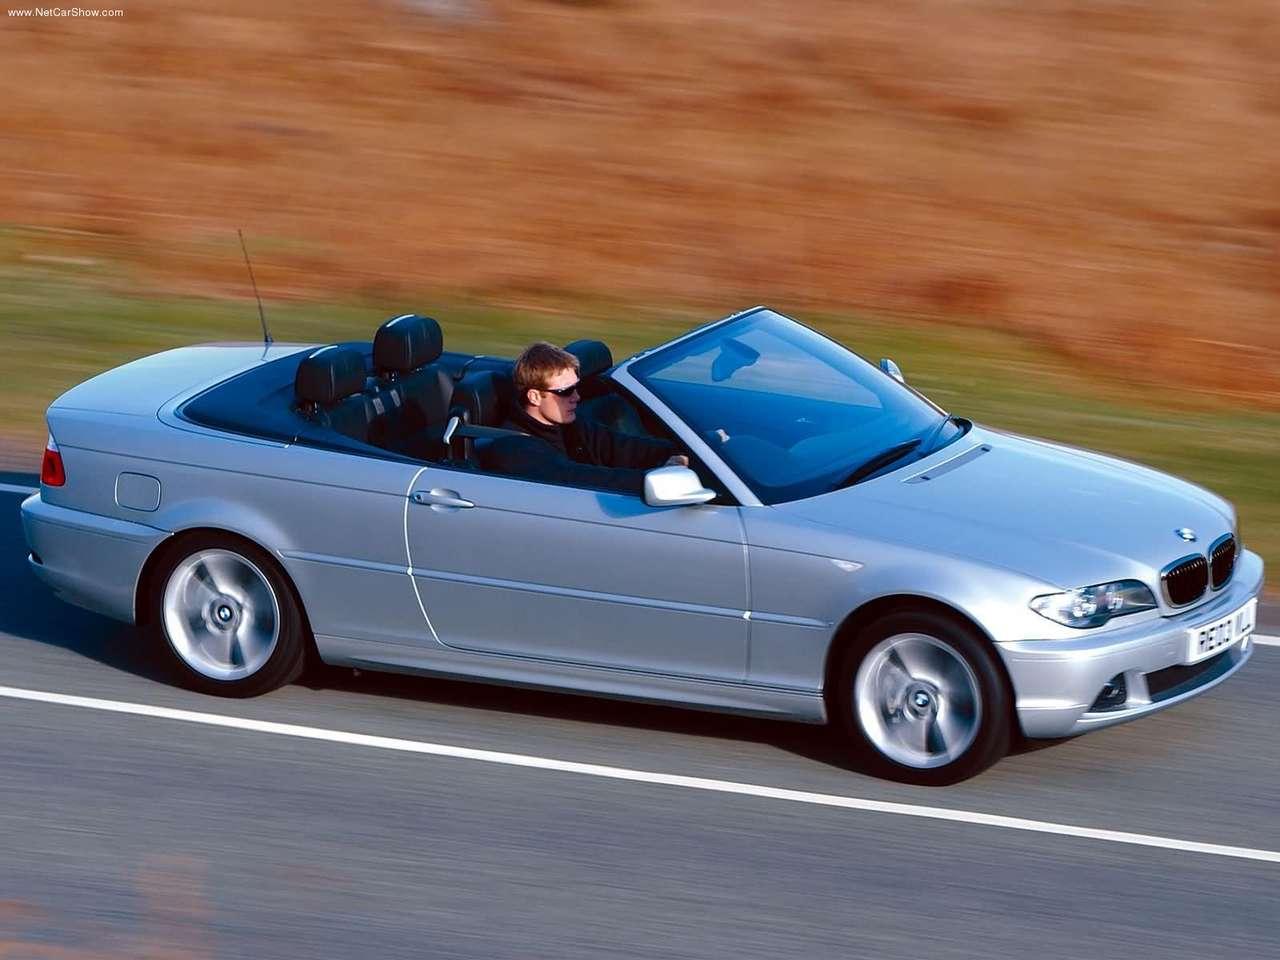 BMW - Auto twenty-first century: 2004 BMW 318Ci Convertible